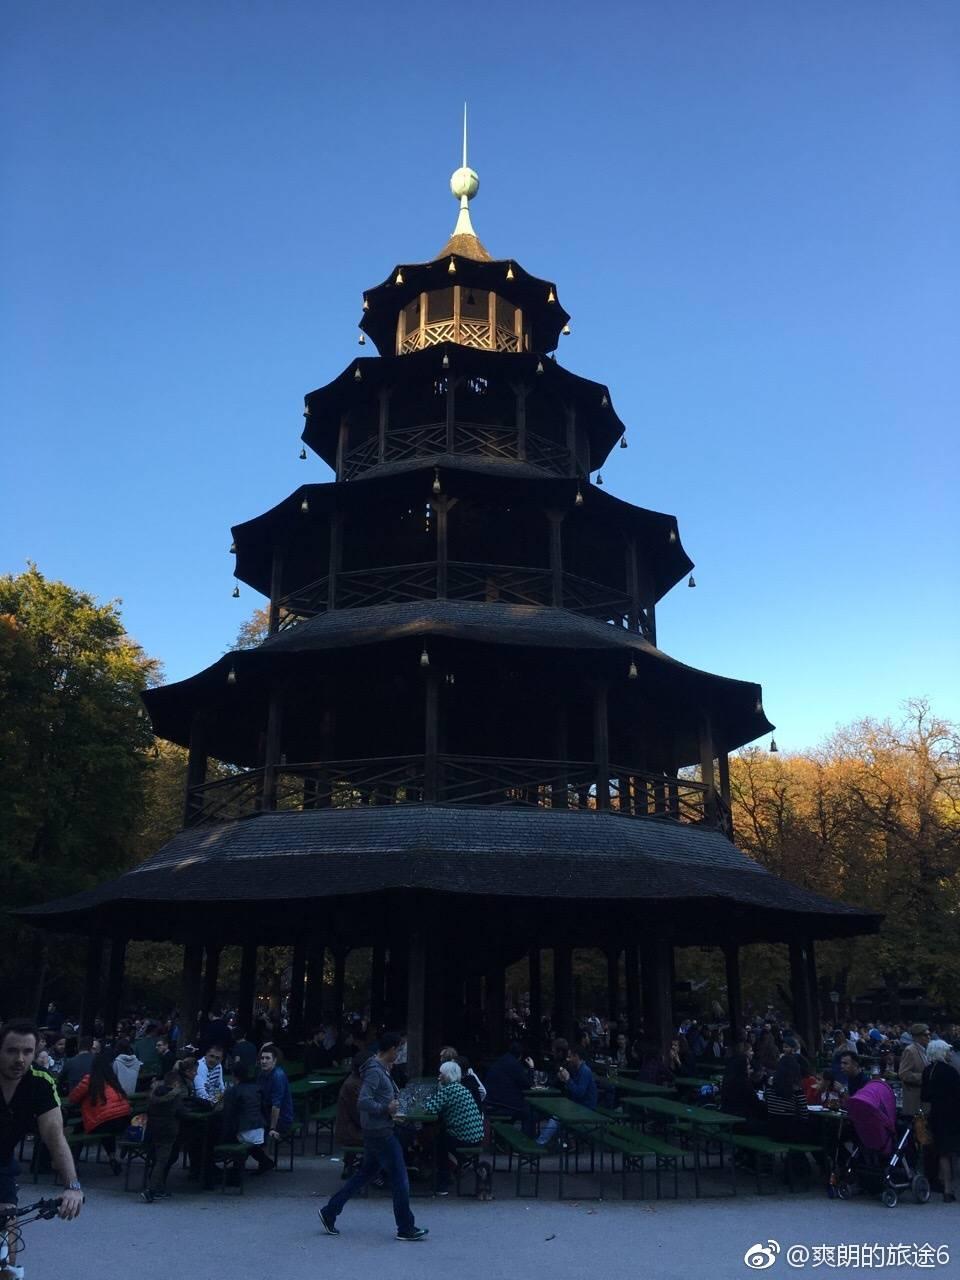 China Garten Best Of Chinesischer Turm attractions Zoe爷 Munich Travel Review